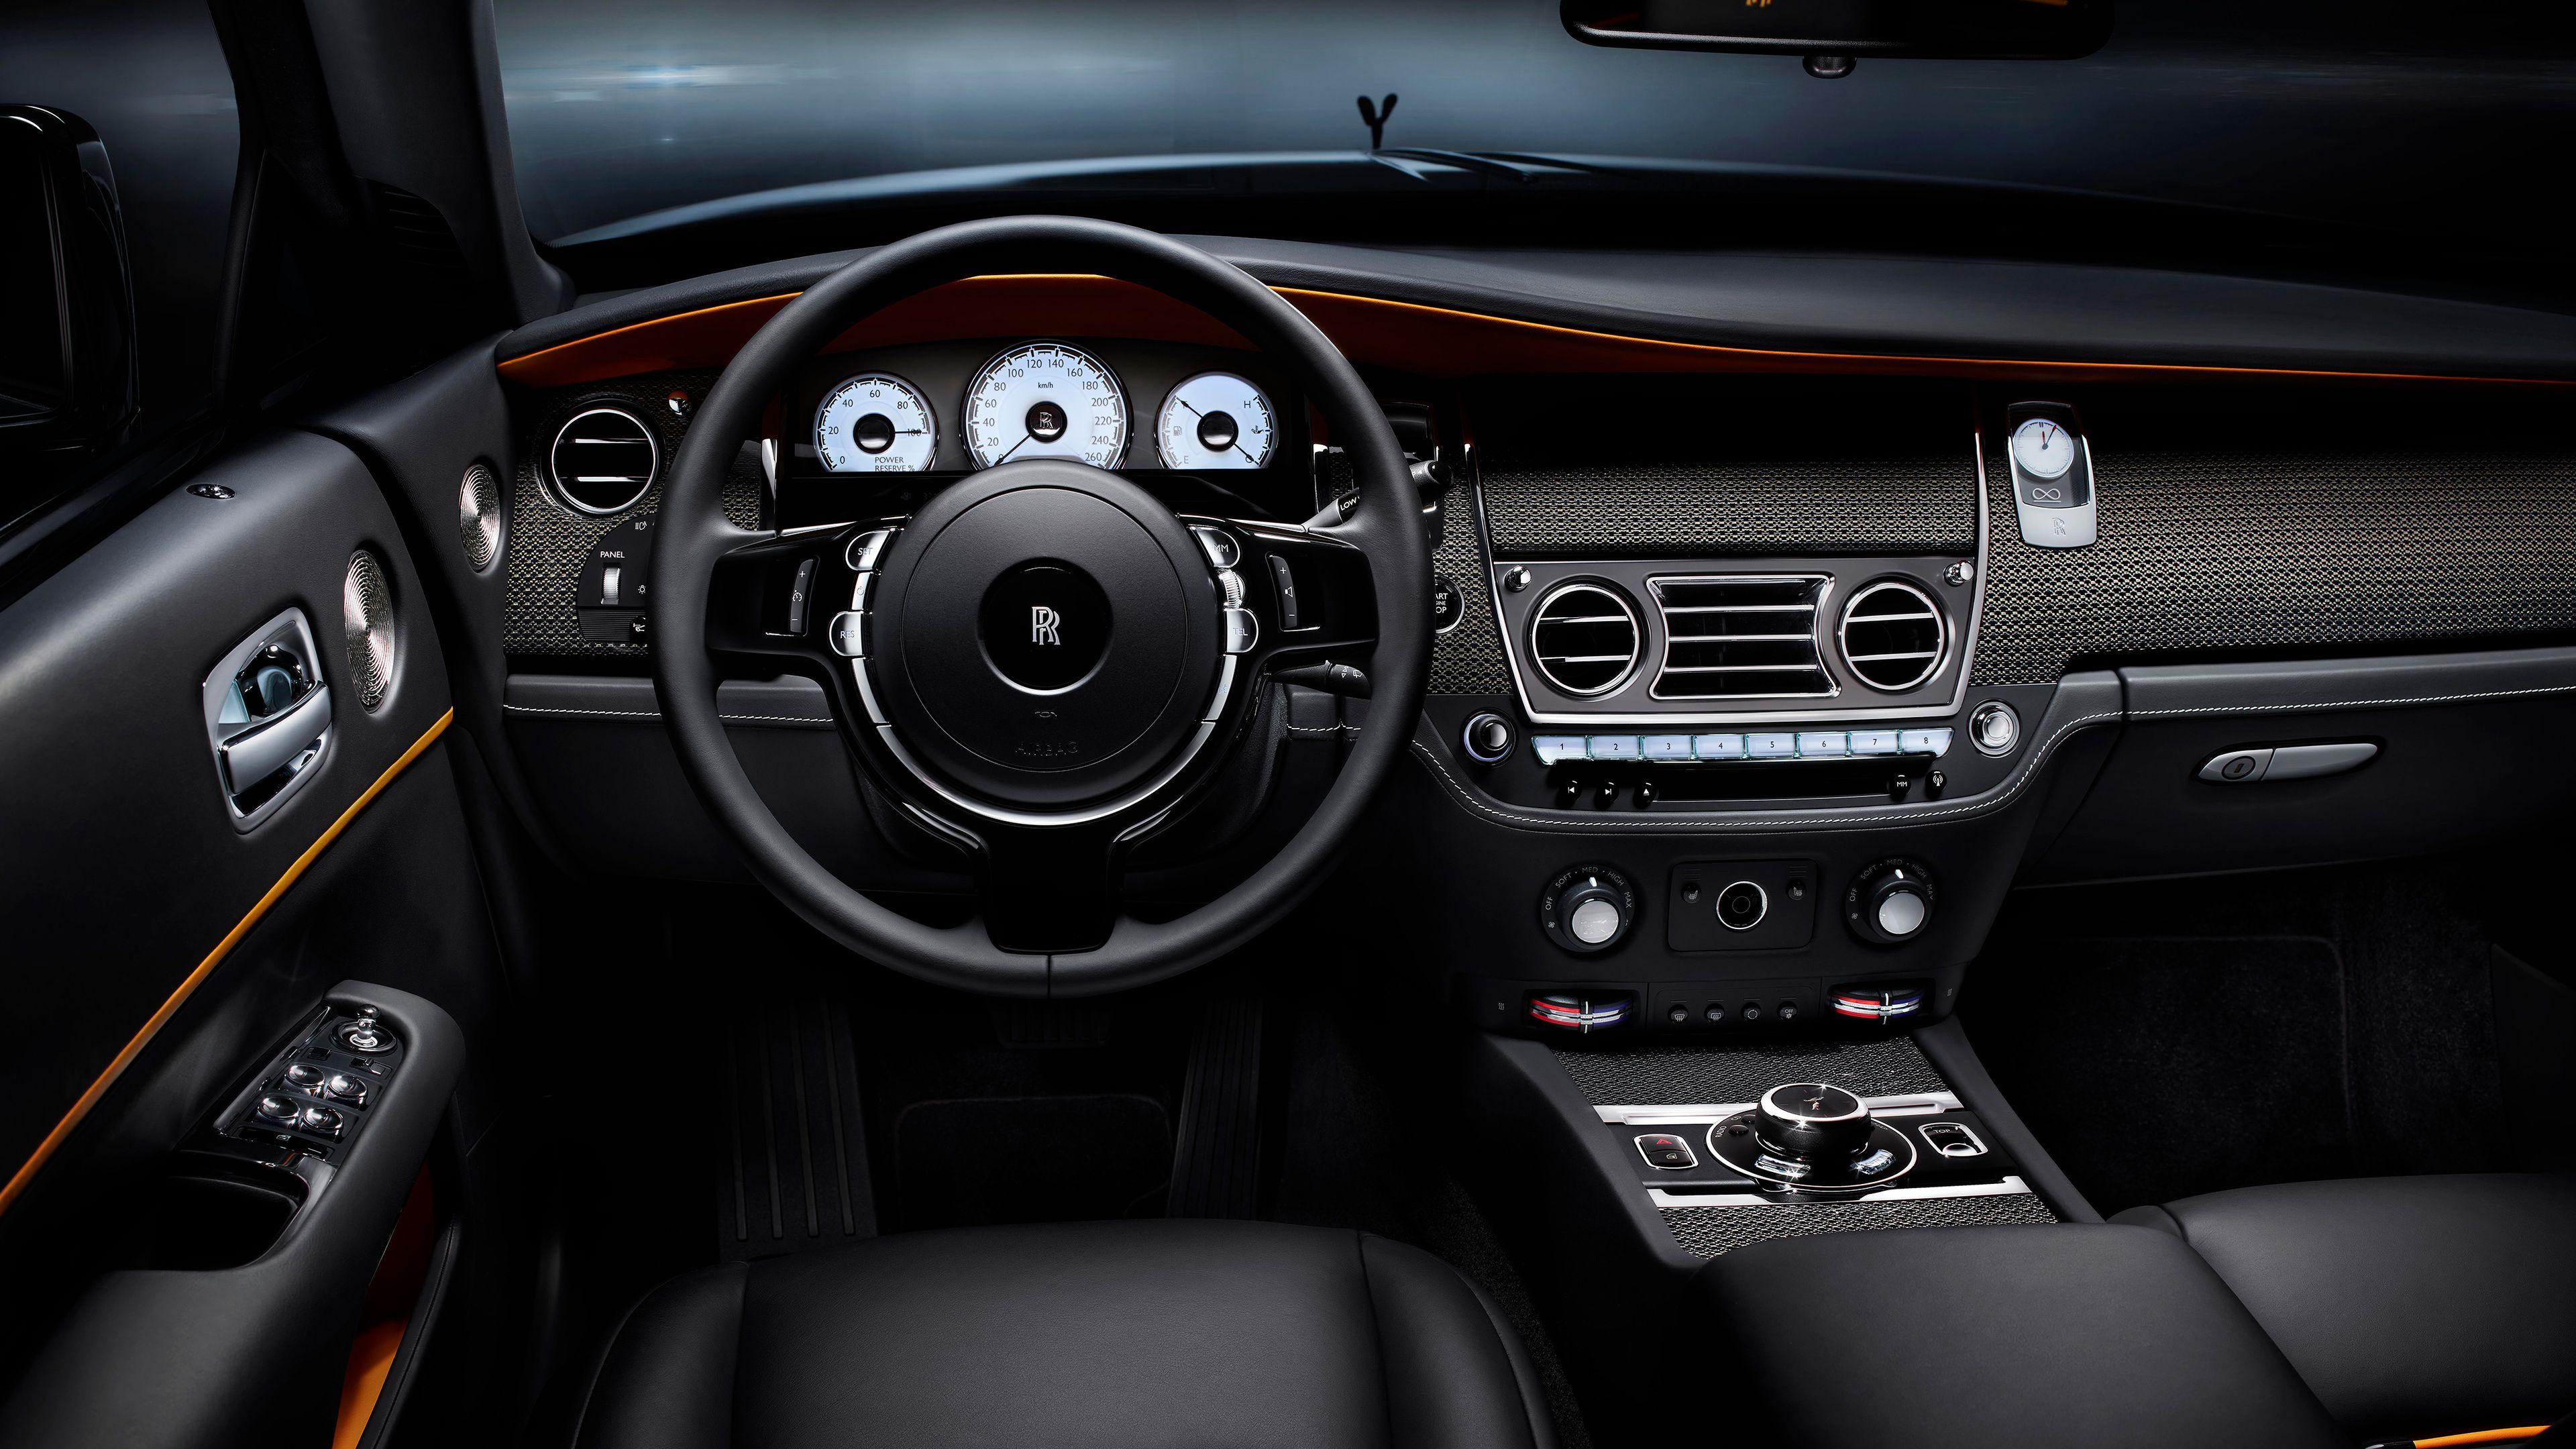 Rolls Royce Dawn Black Badge Interior 4k steering wallpapers, rolls royce wallpa…